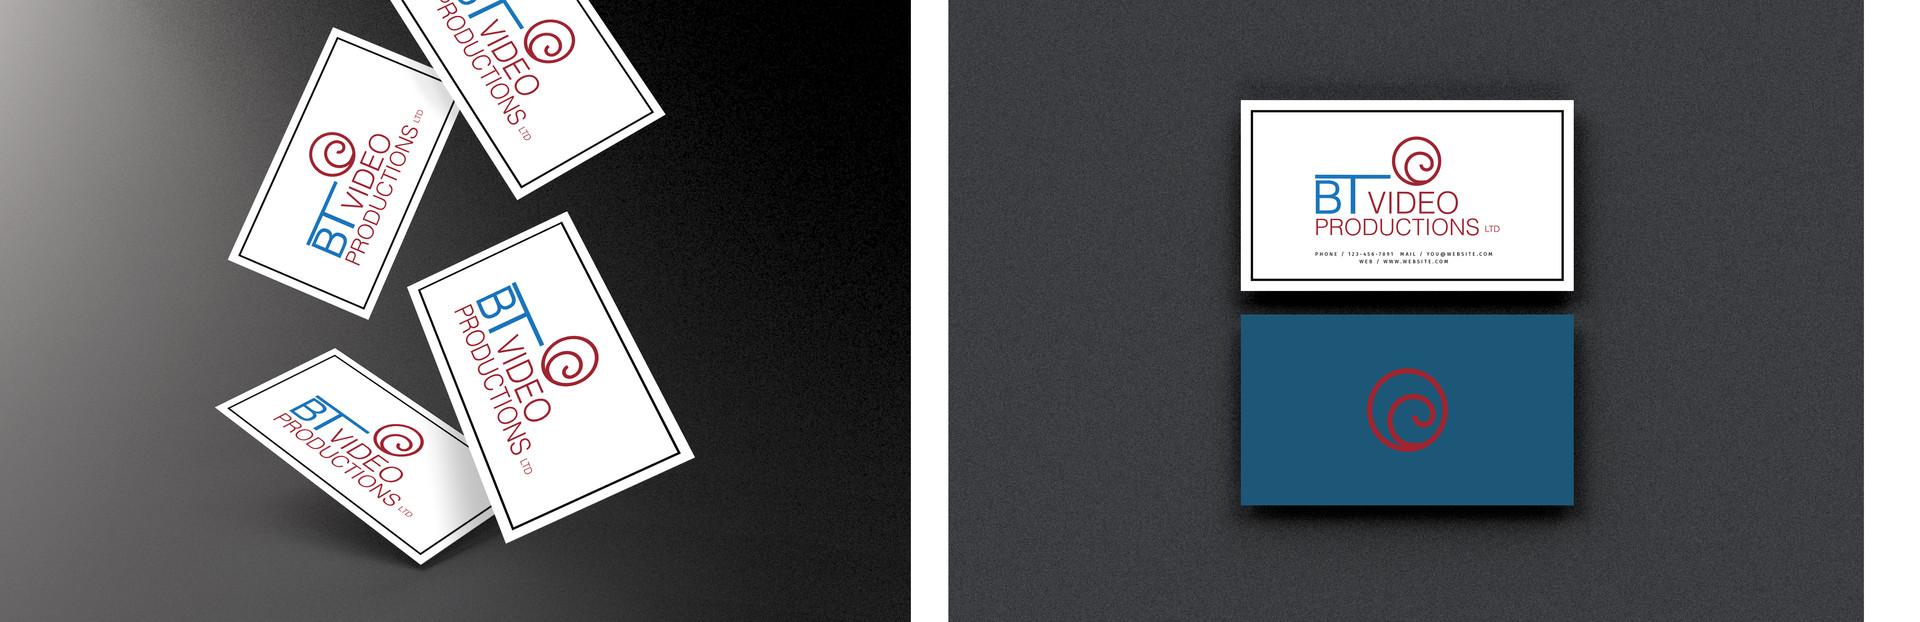 12 Card Graphic .jpg